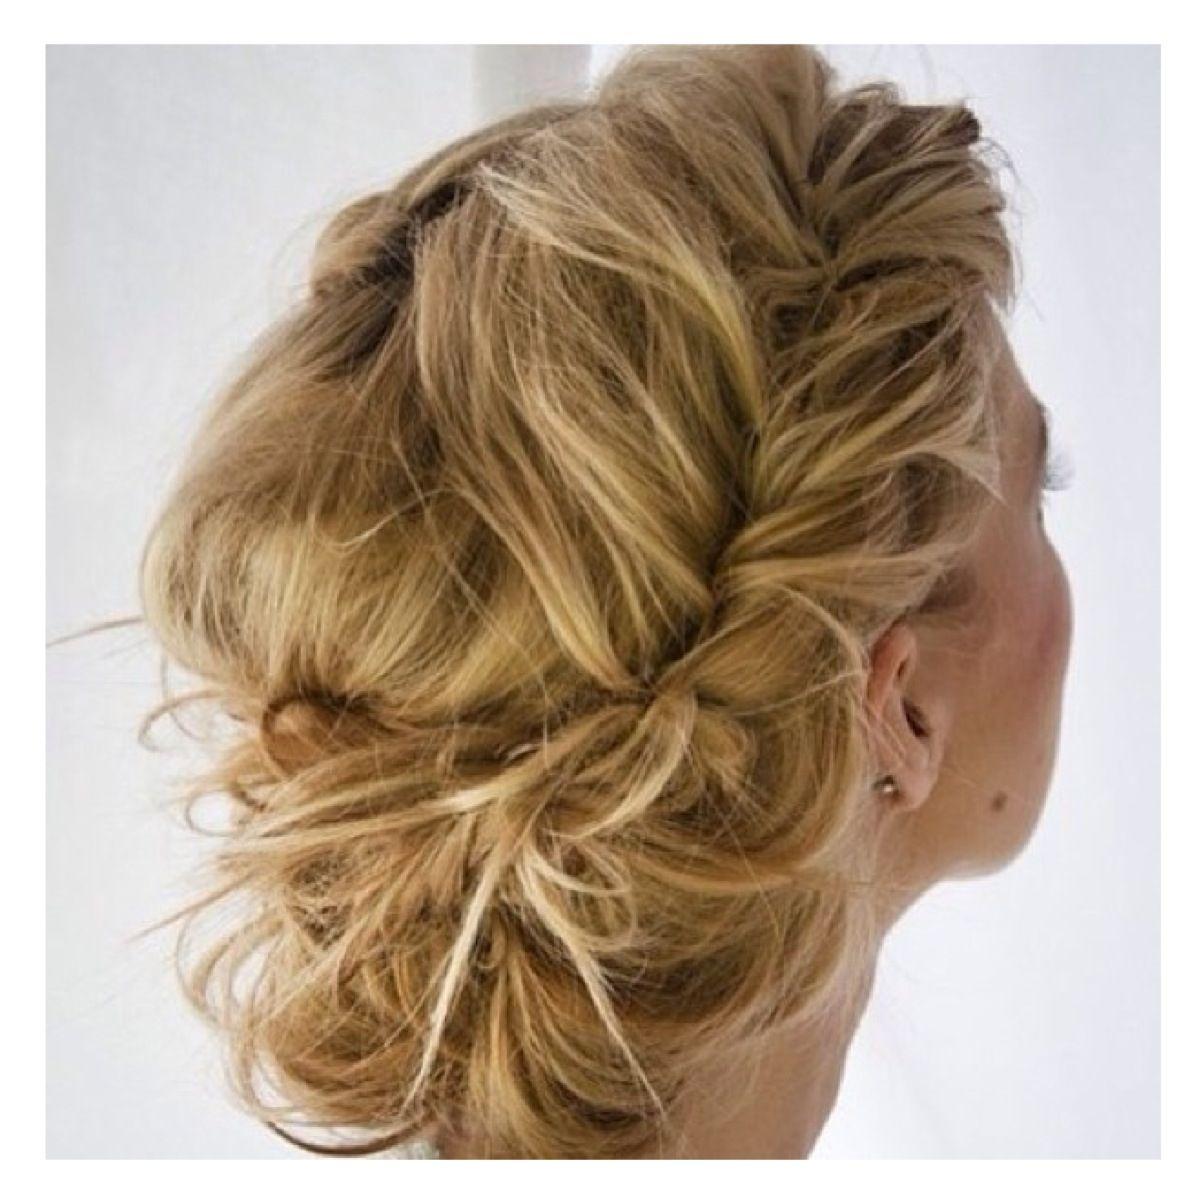 Wedding Hairstyle Messy Bun: Another Great Messy Bun! #Wedding Hair!